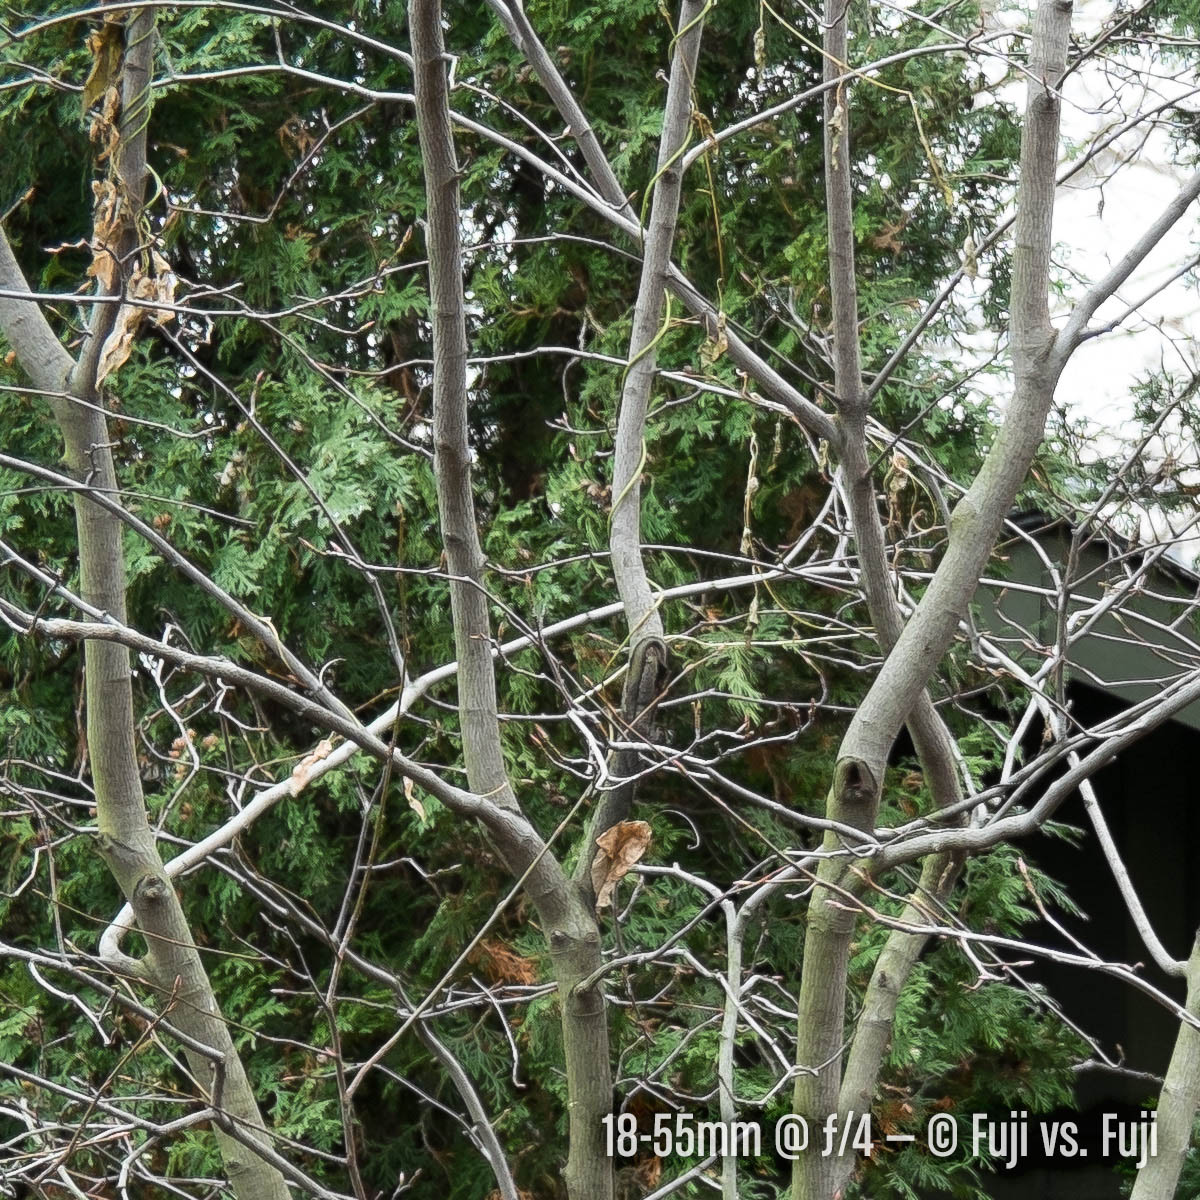 fujivsfuji-sharpness-crop3-18-55@4.jpg